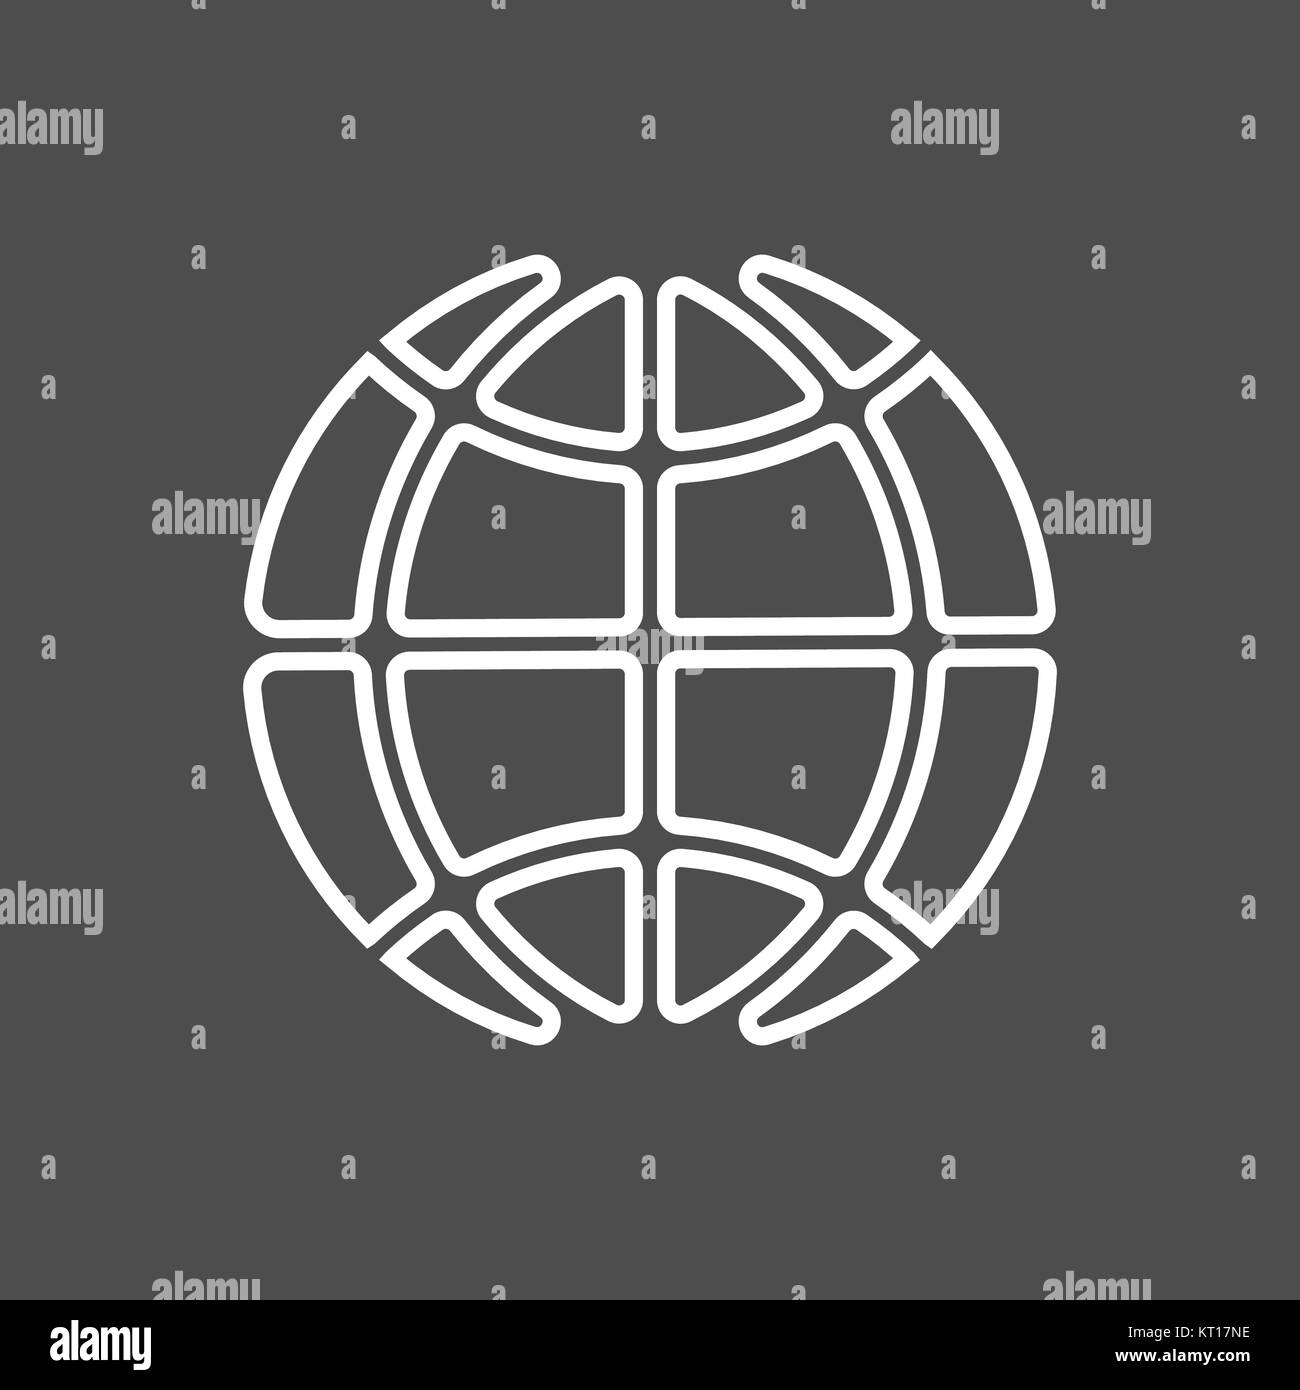 vector icon earth - Stock Image